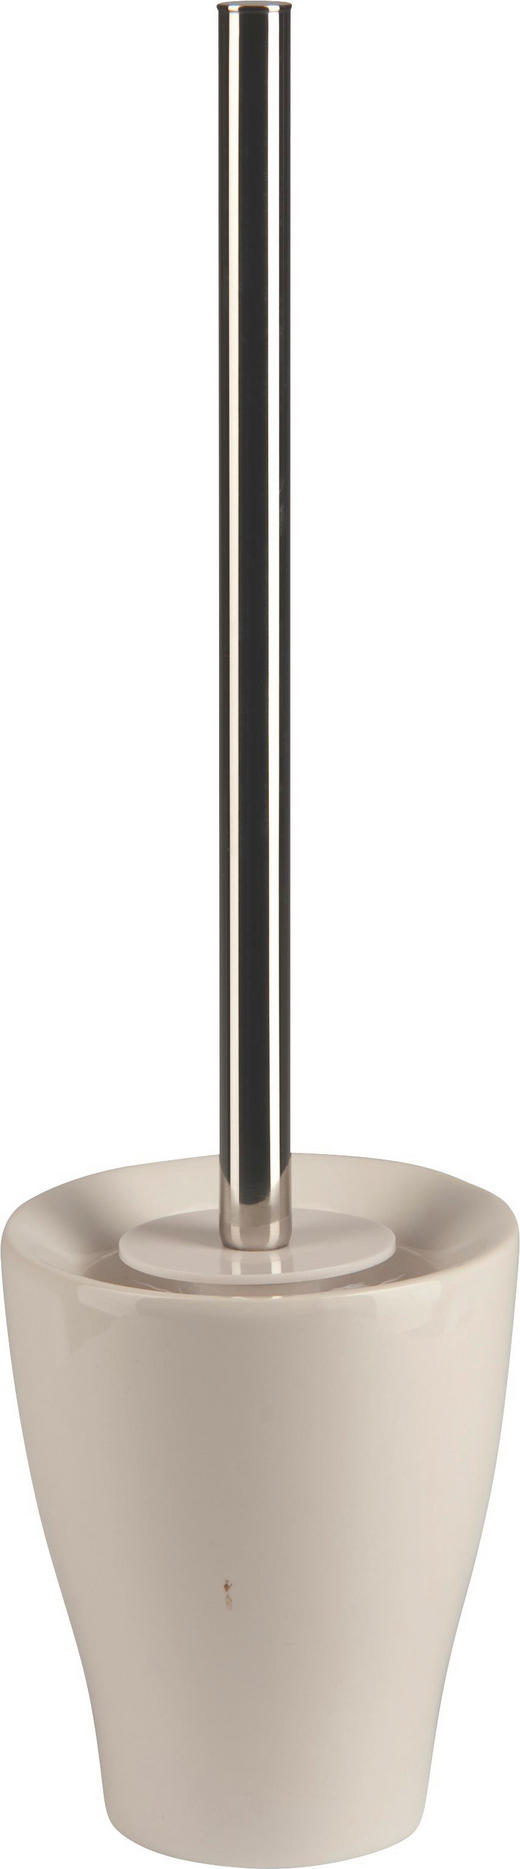 WC-BÜRSTENGARNITUR - Chromfarben/Weiß, Design, Keramik/Kunststoff (11,5/40/11,5cm)